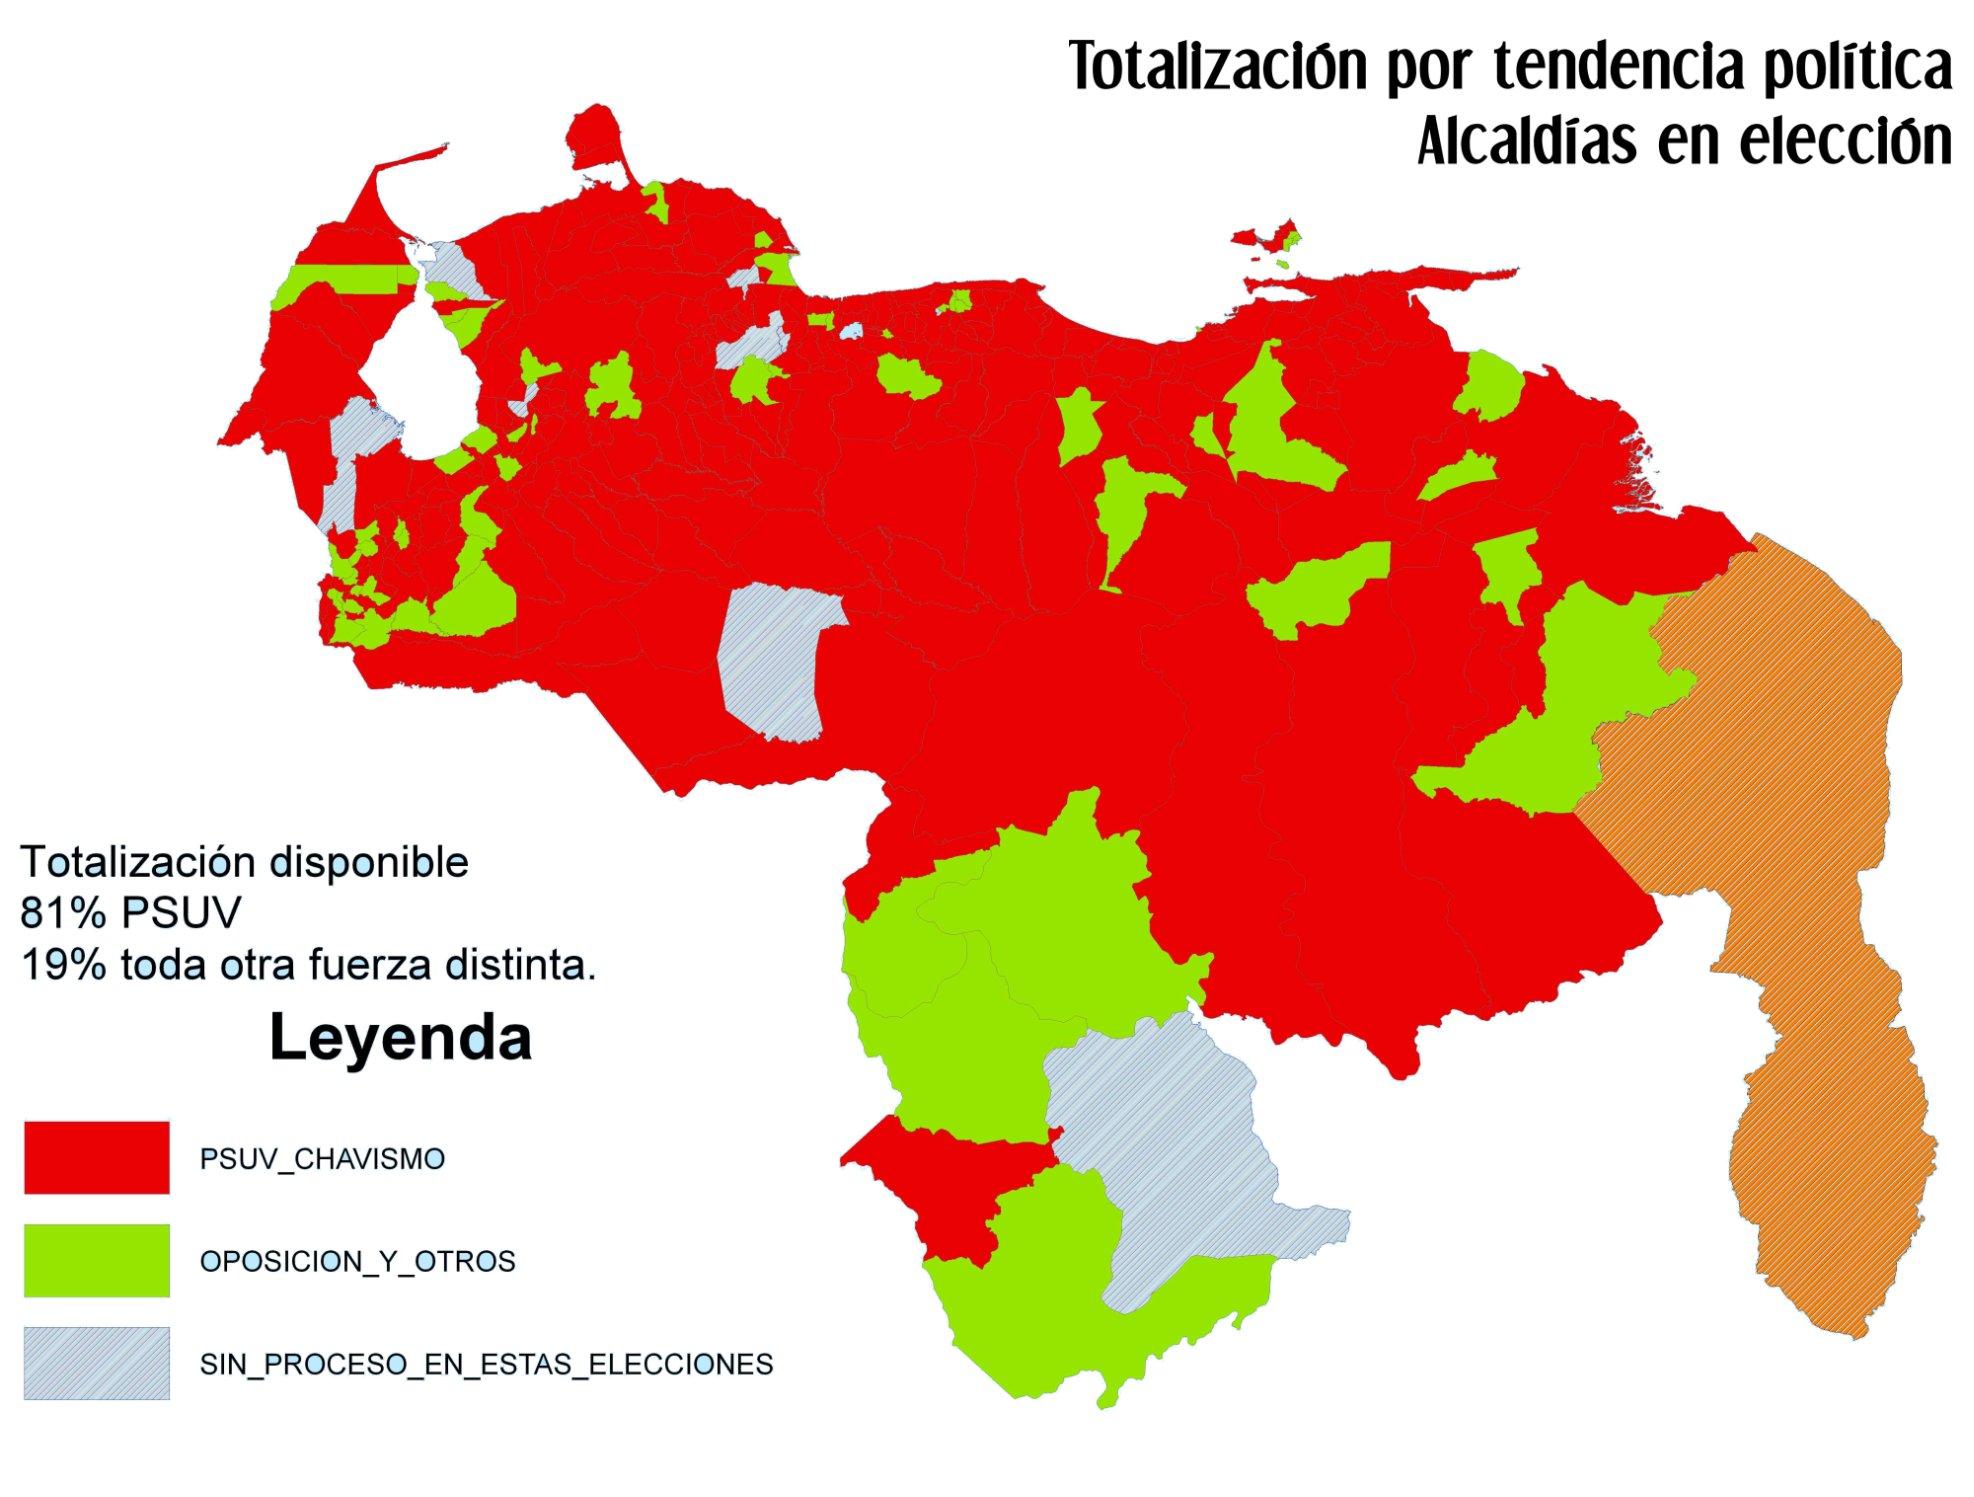 mapa_alcaldias_final_totalizaciones.jpg